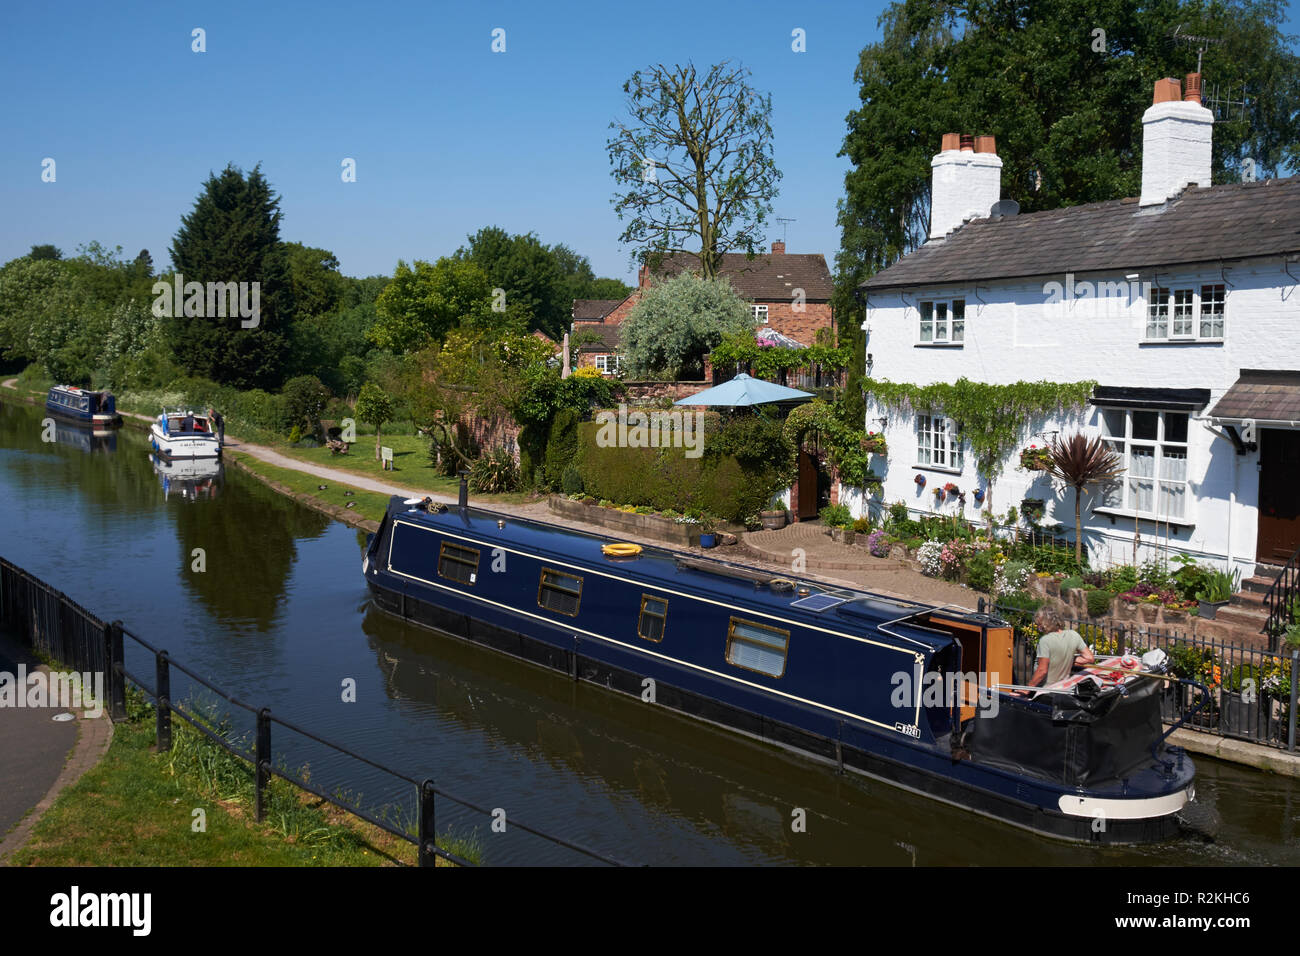 A narrowboat on the Bridgewater Canal at Lymm, Cheshire, UK. - Stock Image